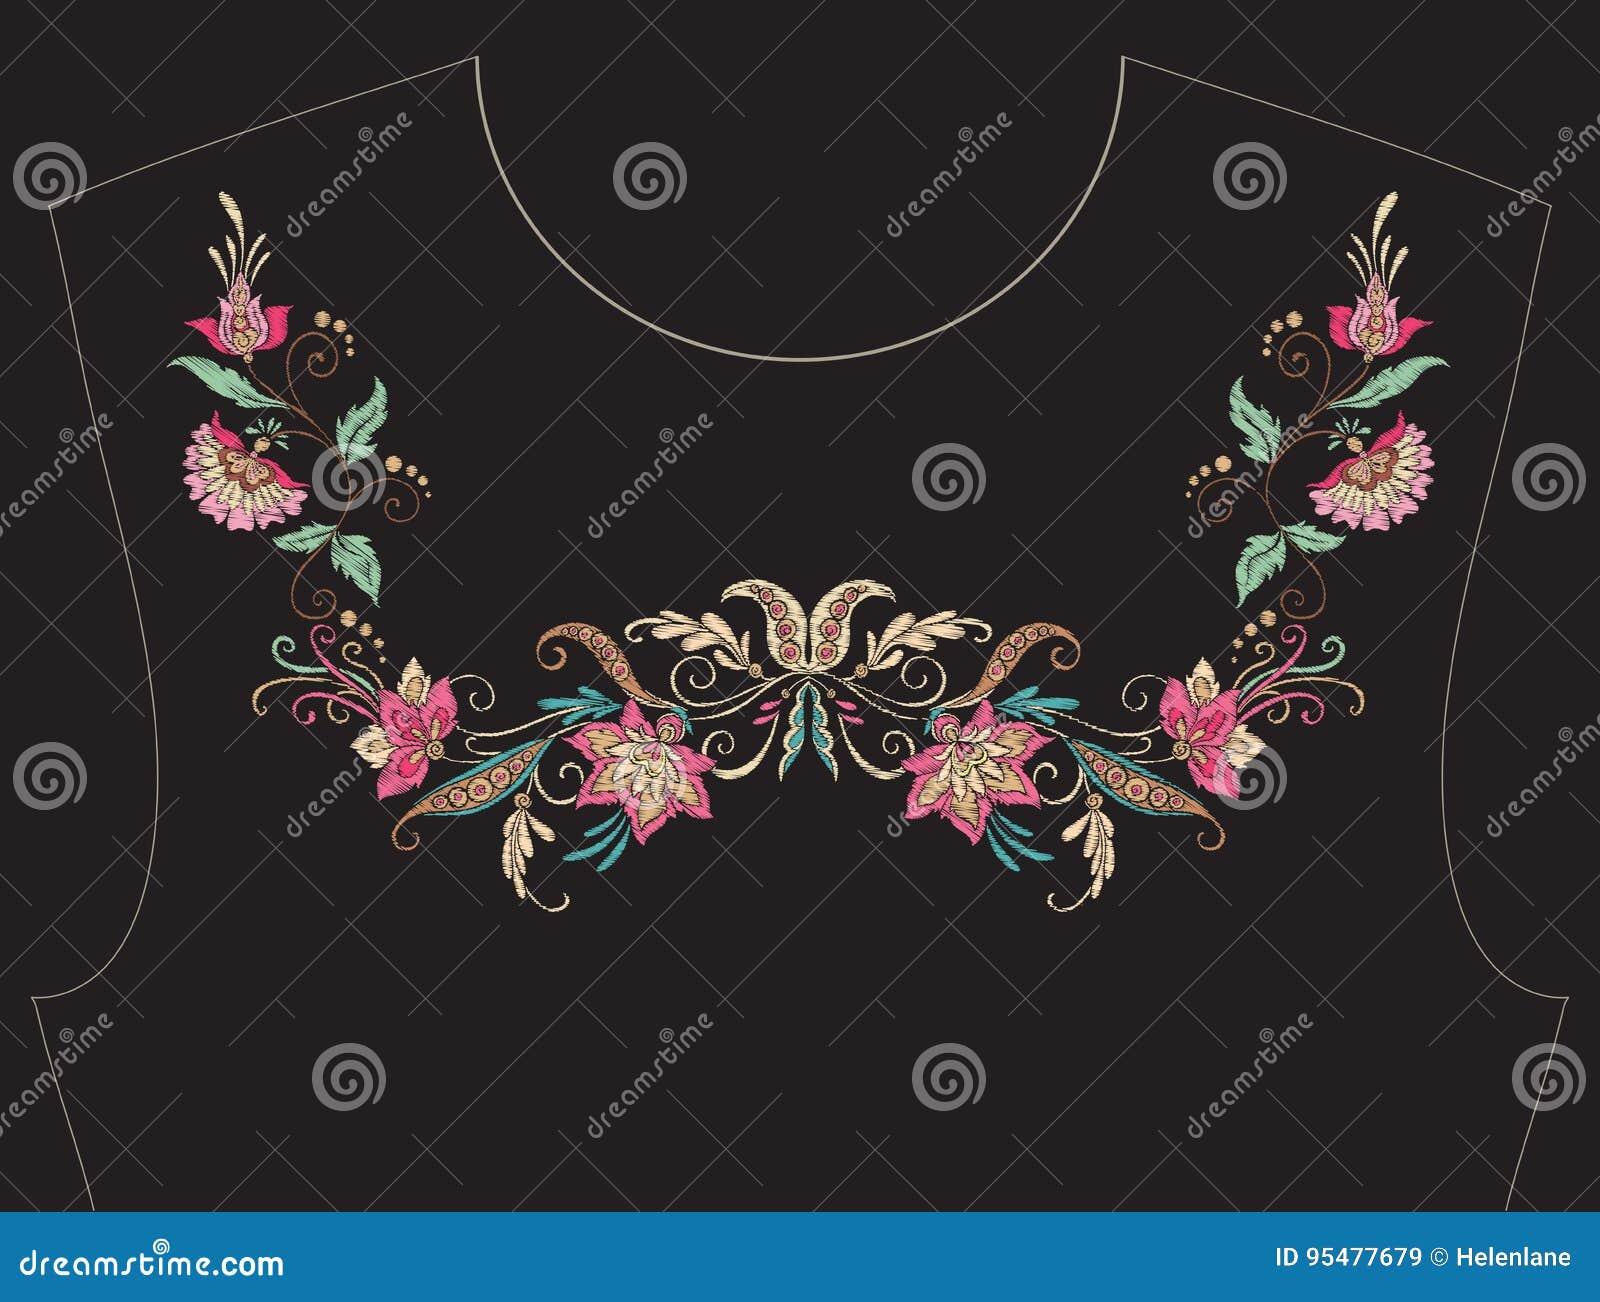 Вышивка для neckline, воротника для футболки, блузки, рубашки